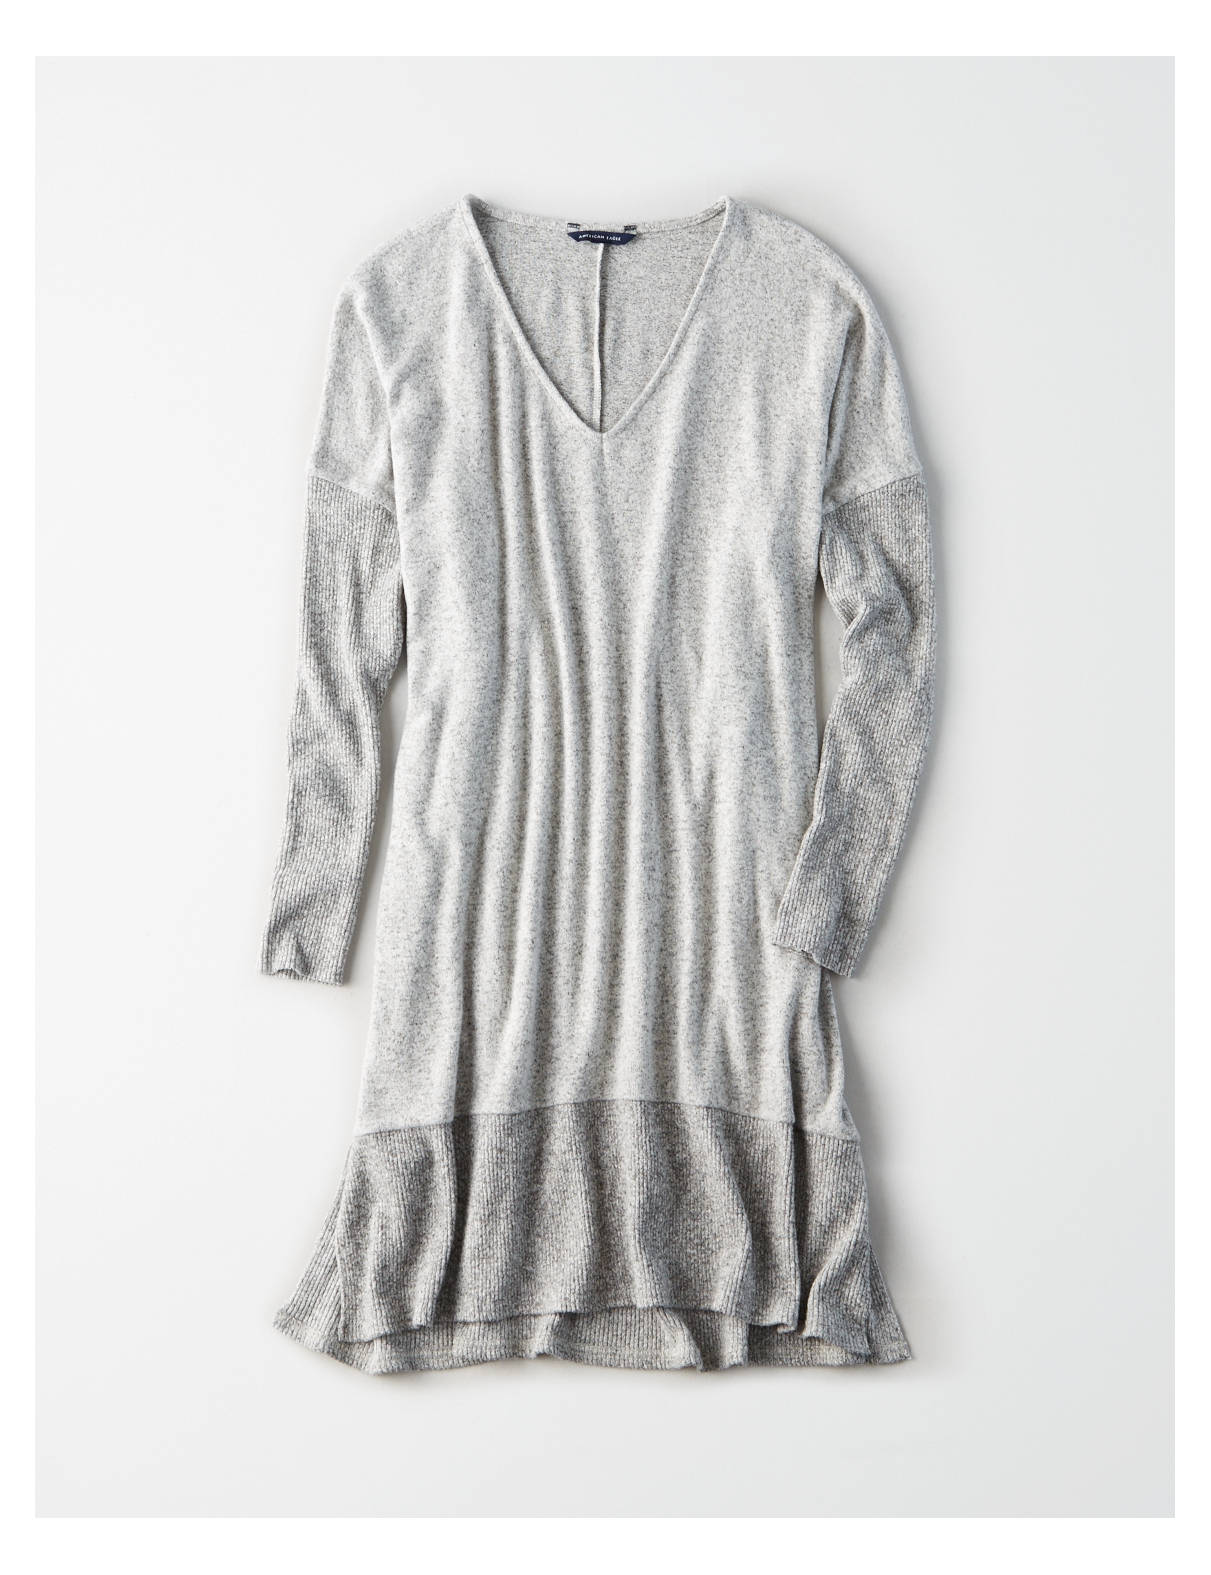 AE Soft & Sexy Plush Shift Dress